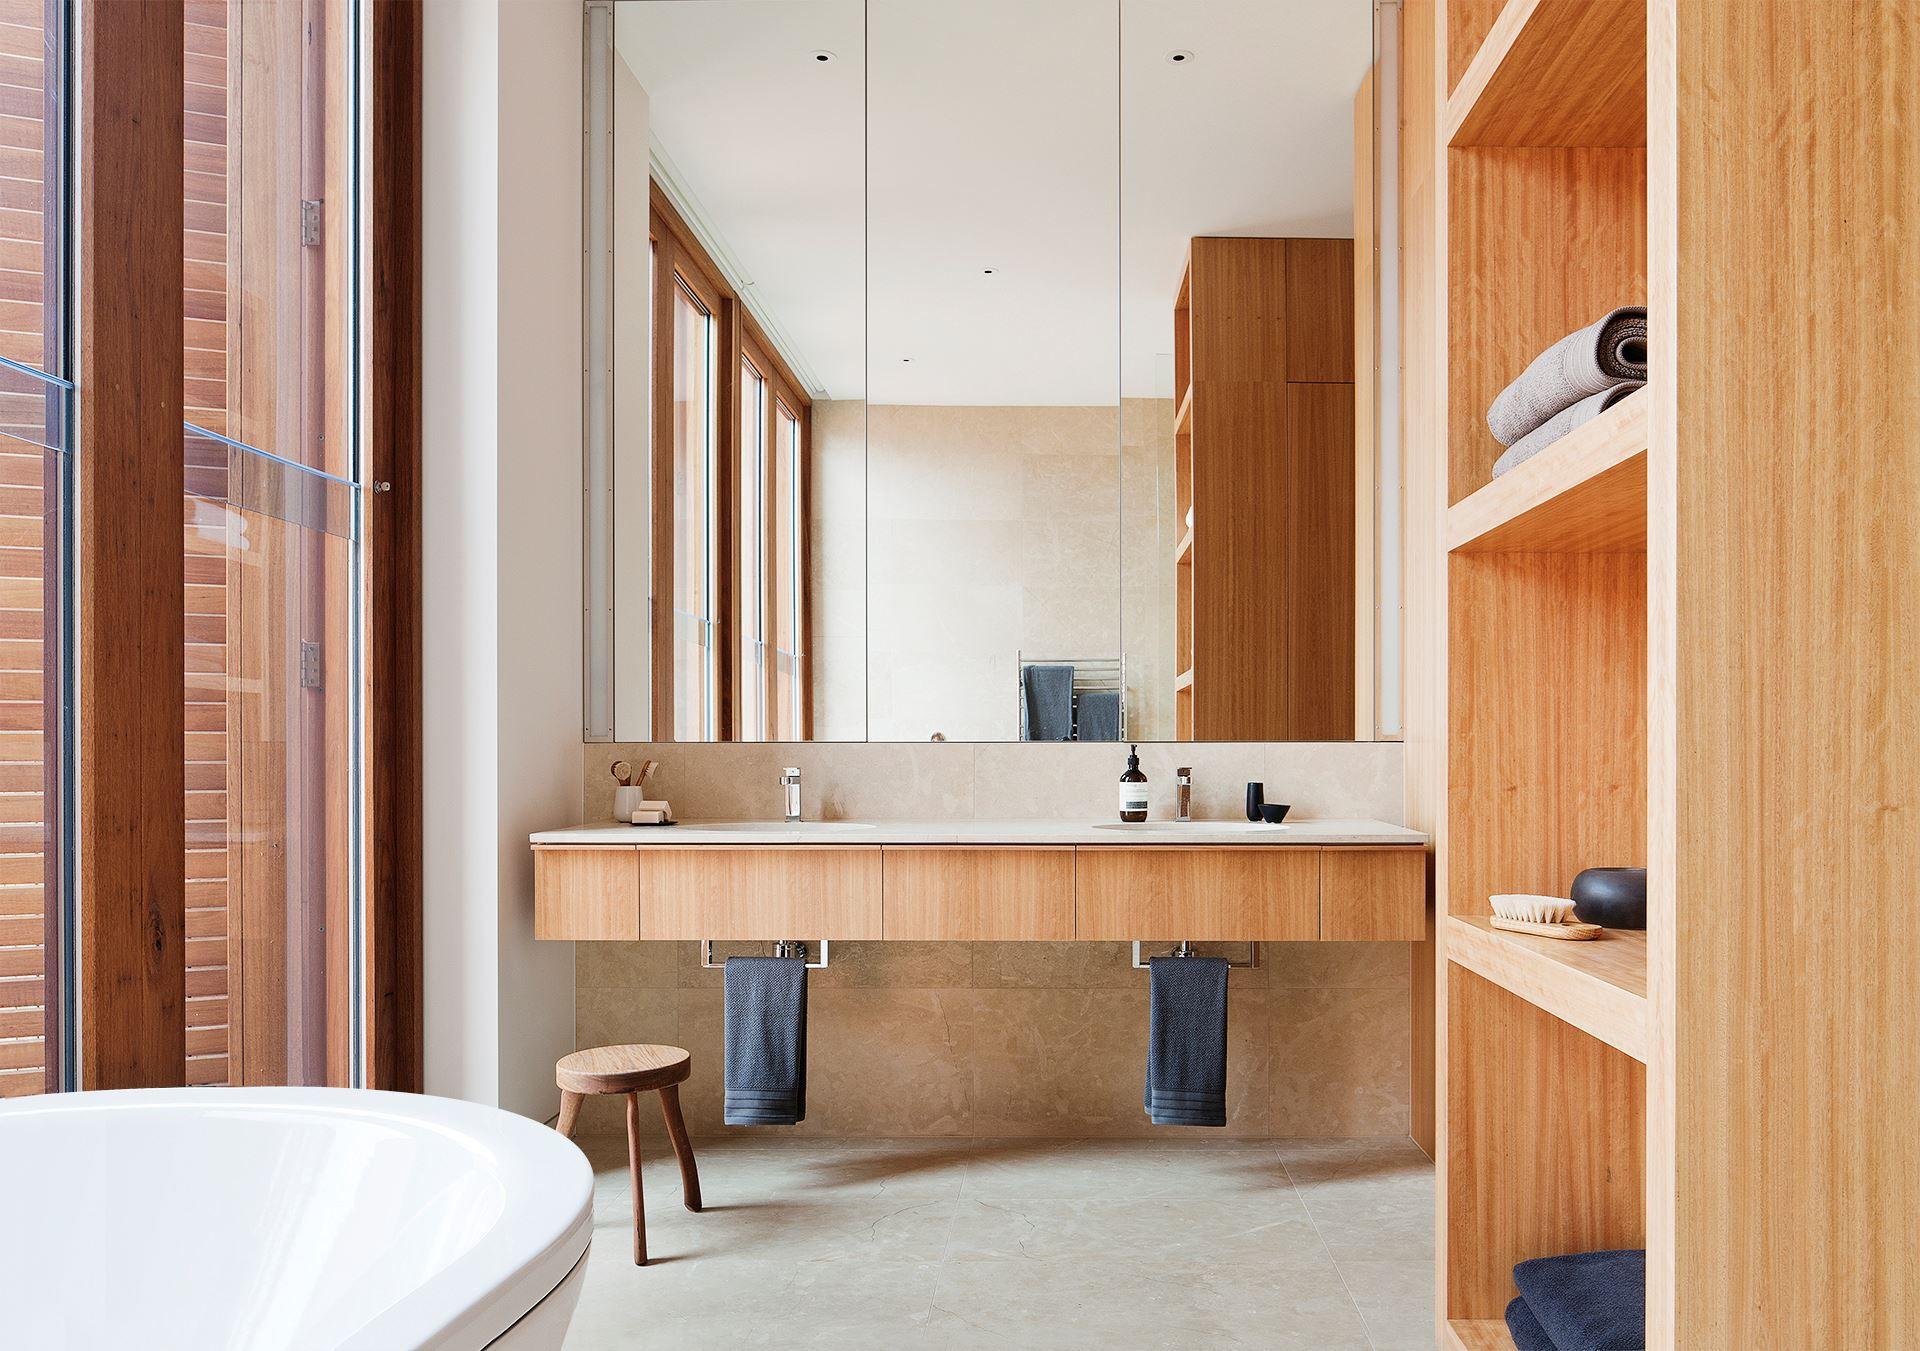 50 Inspiring Bathroom Design Ideas on Bathroom Remodel Design Ideas  id=46933